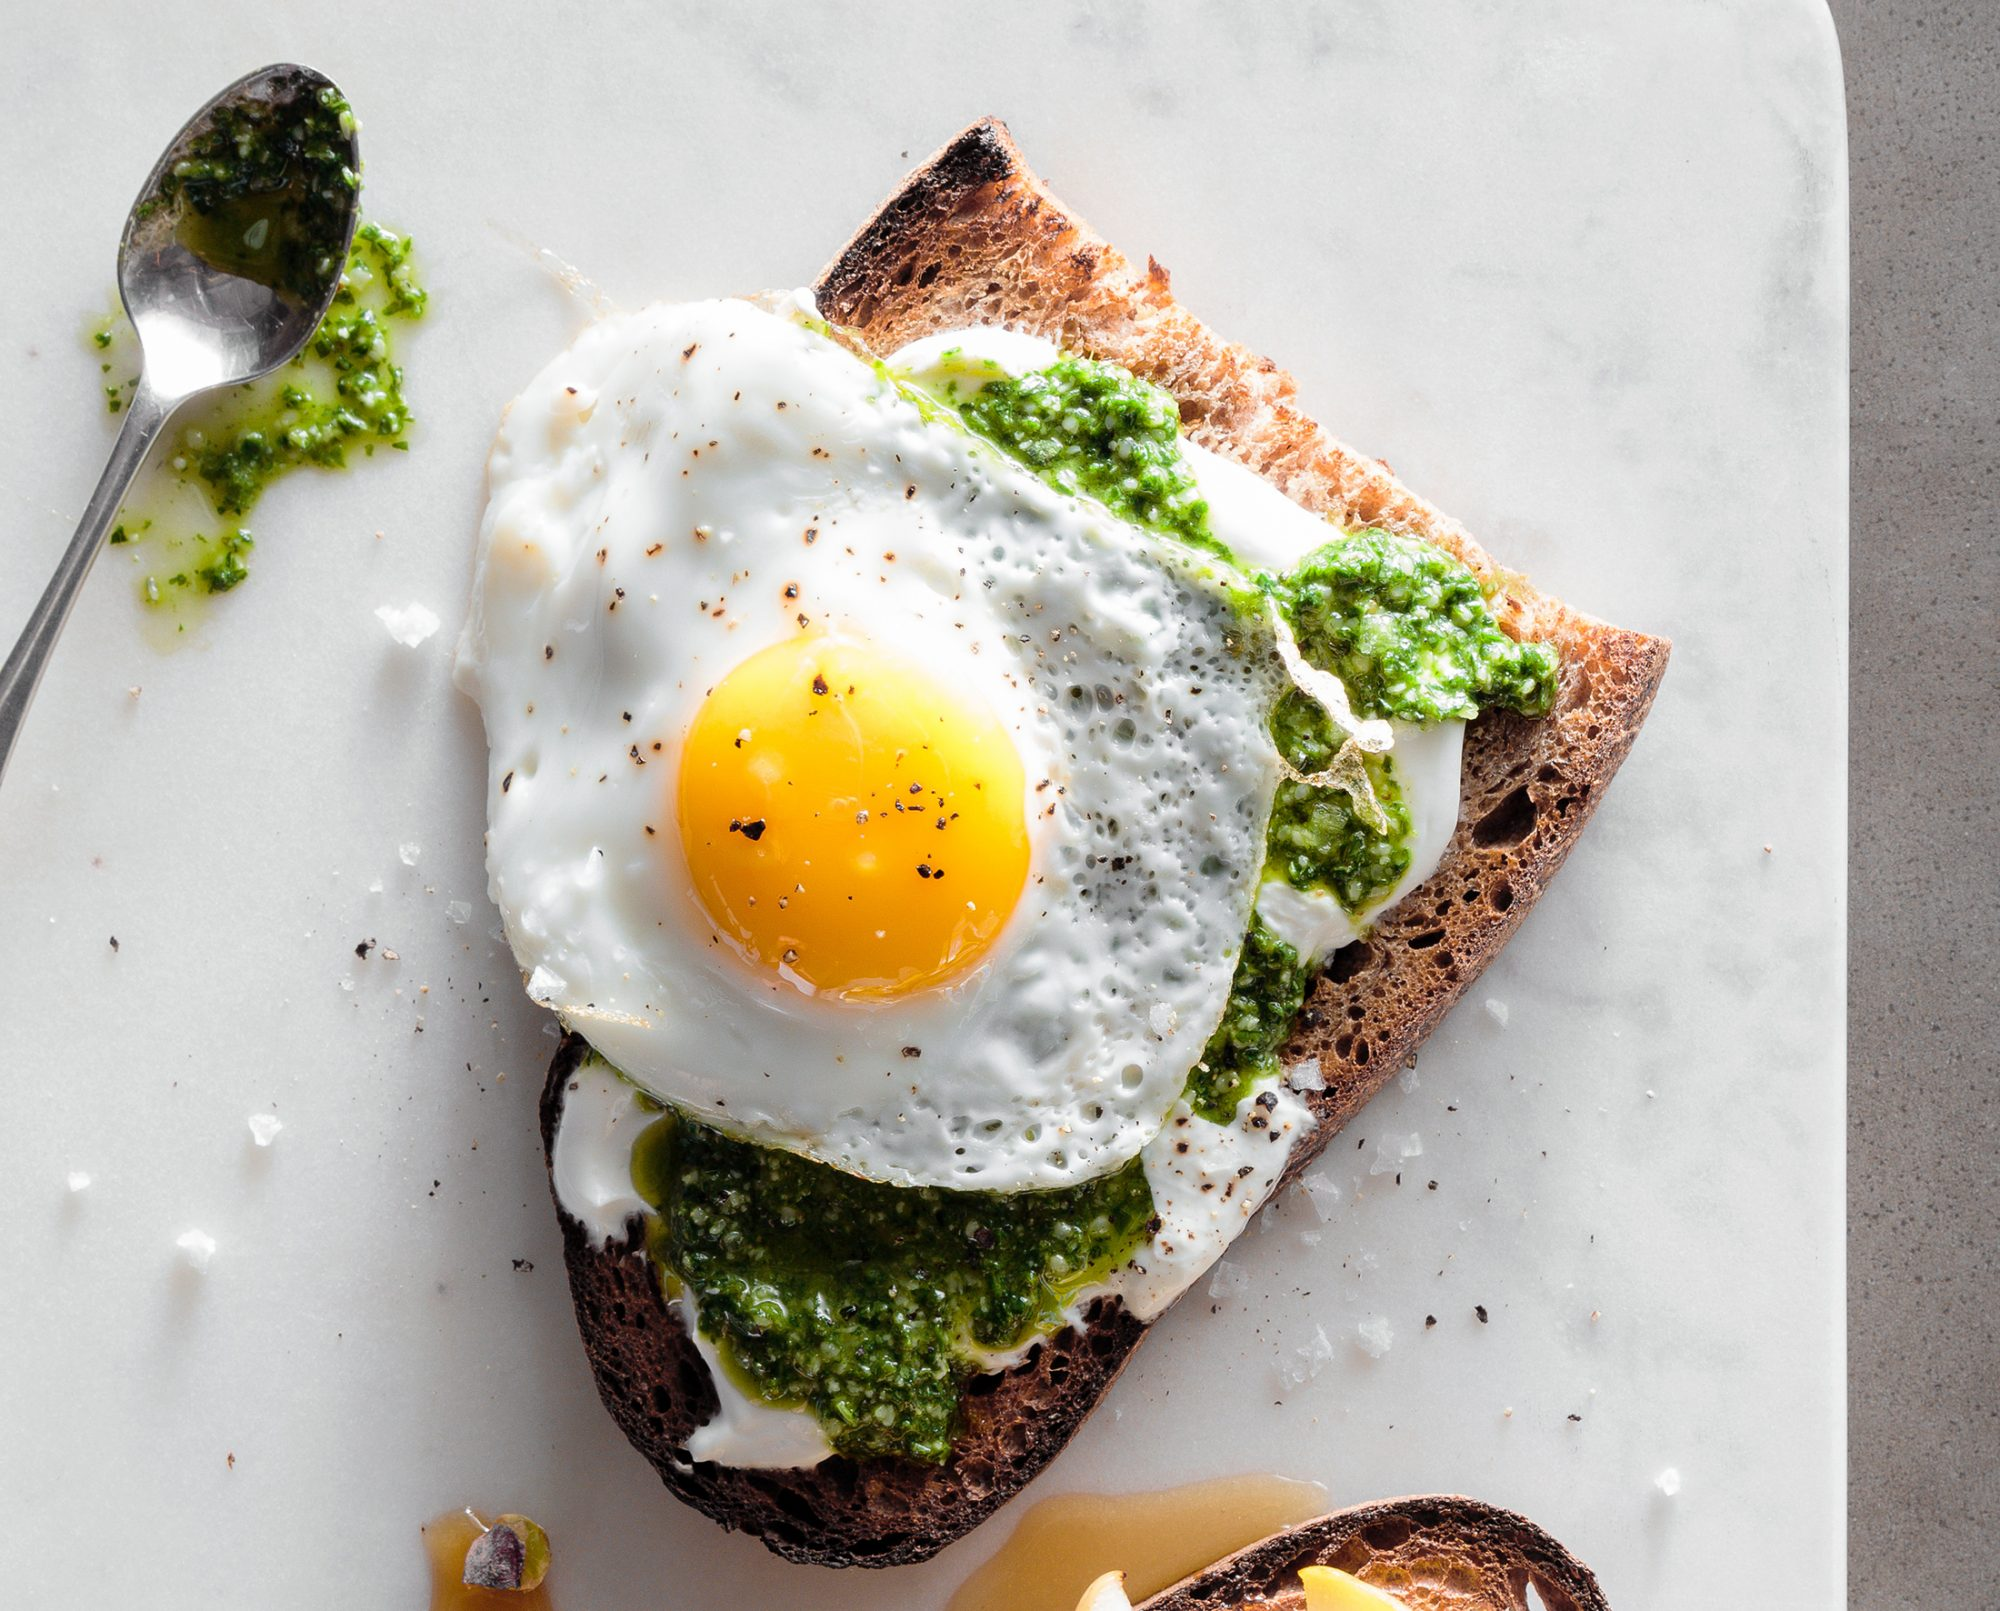 Cilantro and Kale Pesto Toast with a Fried Egg